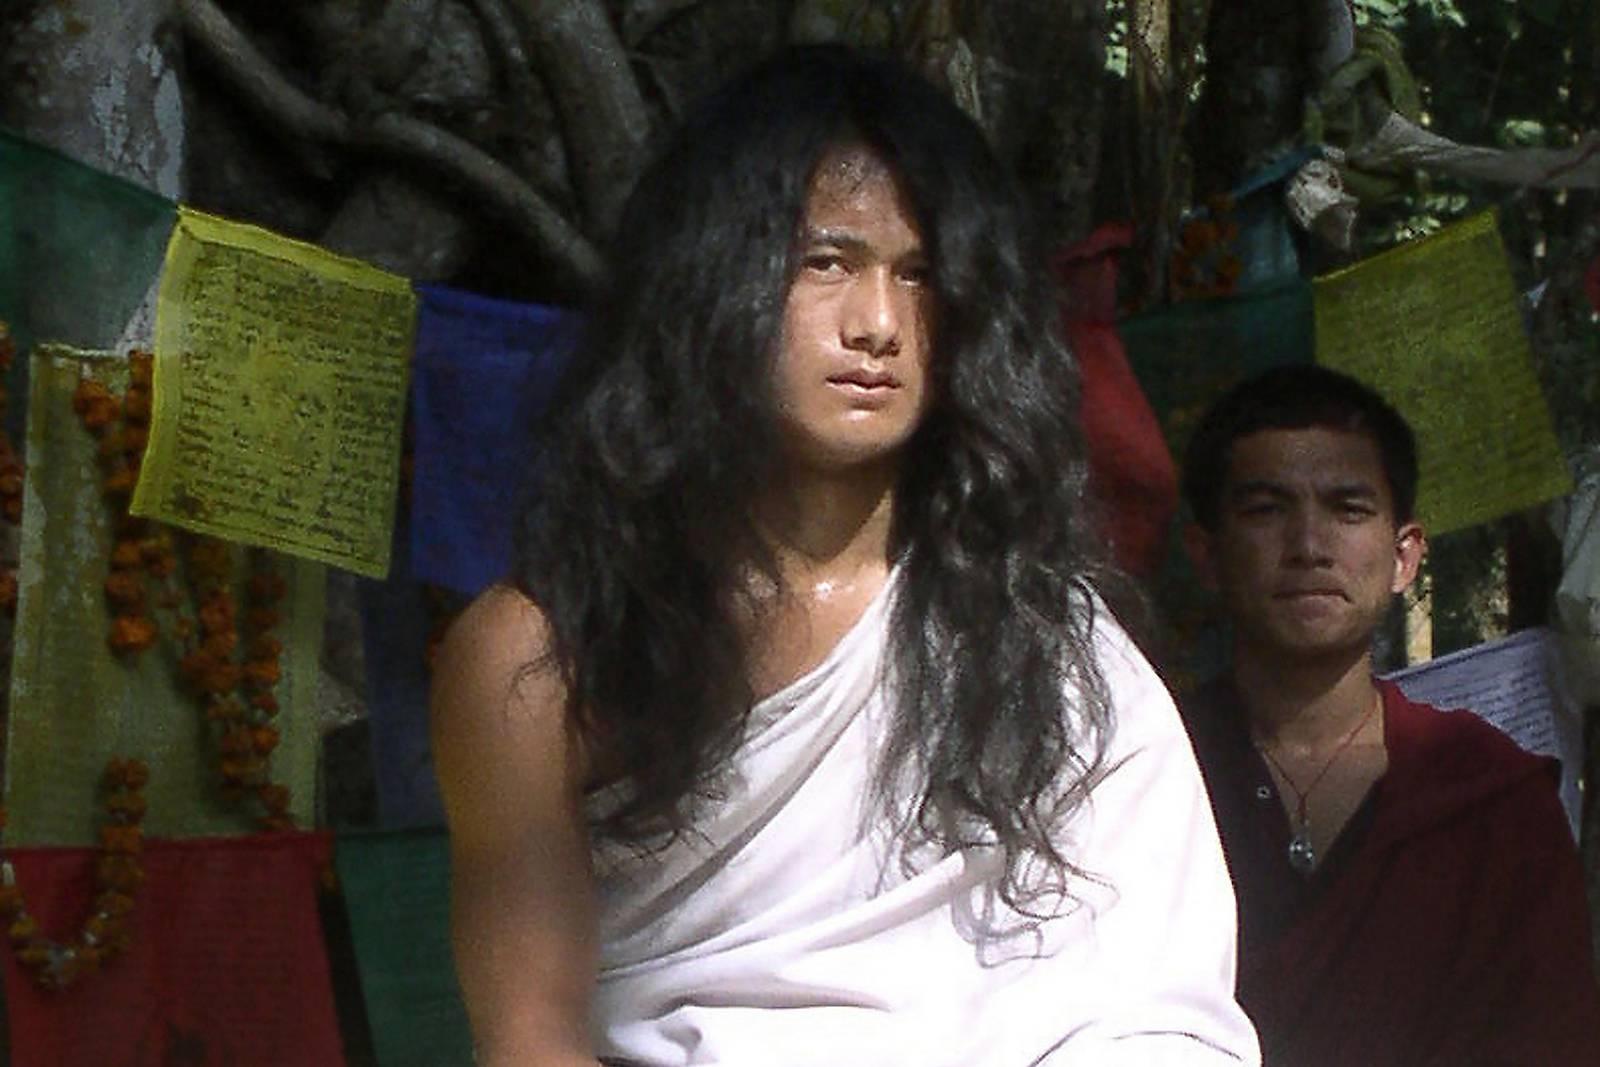 Menschen verschwunden: Nepal ermittelt gegen Guru